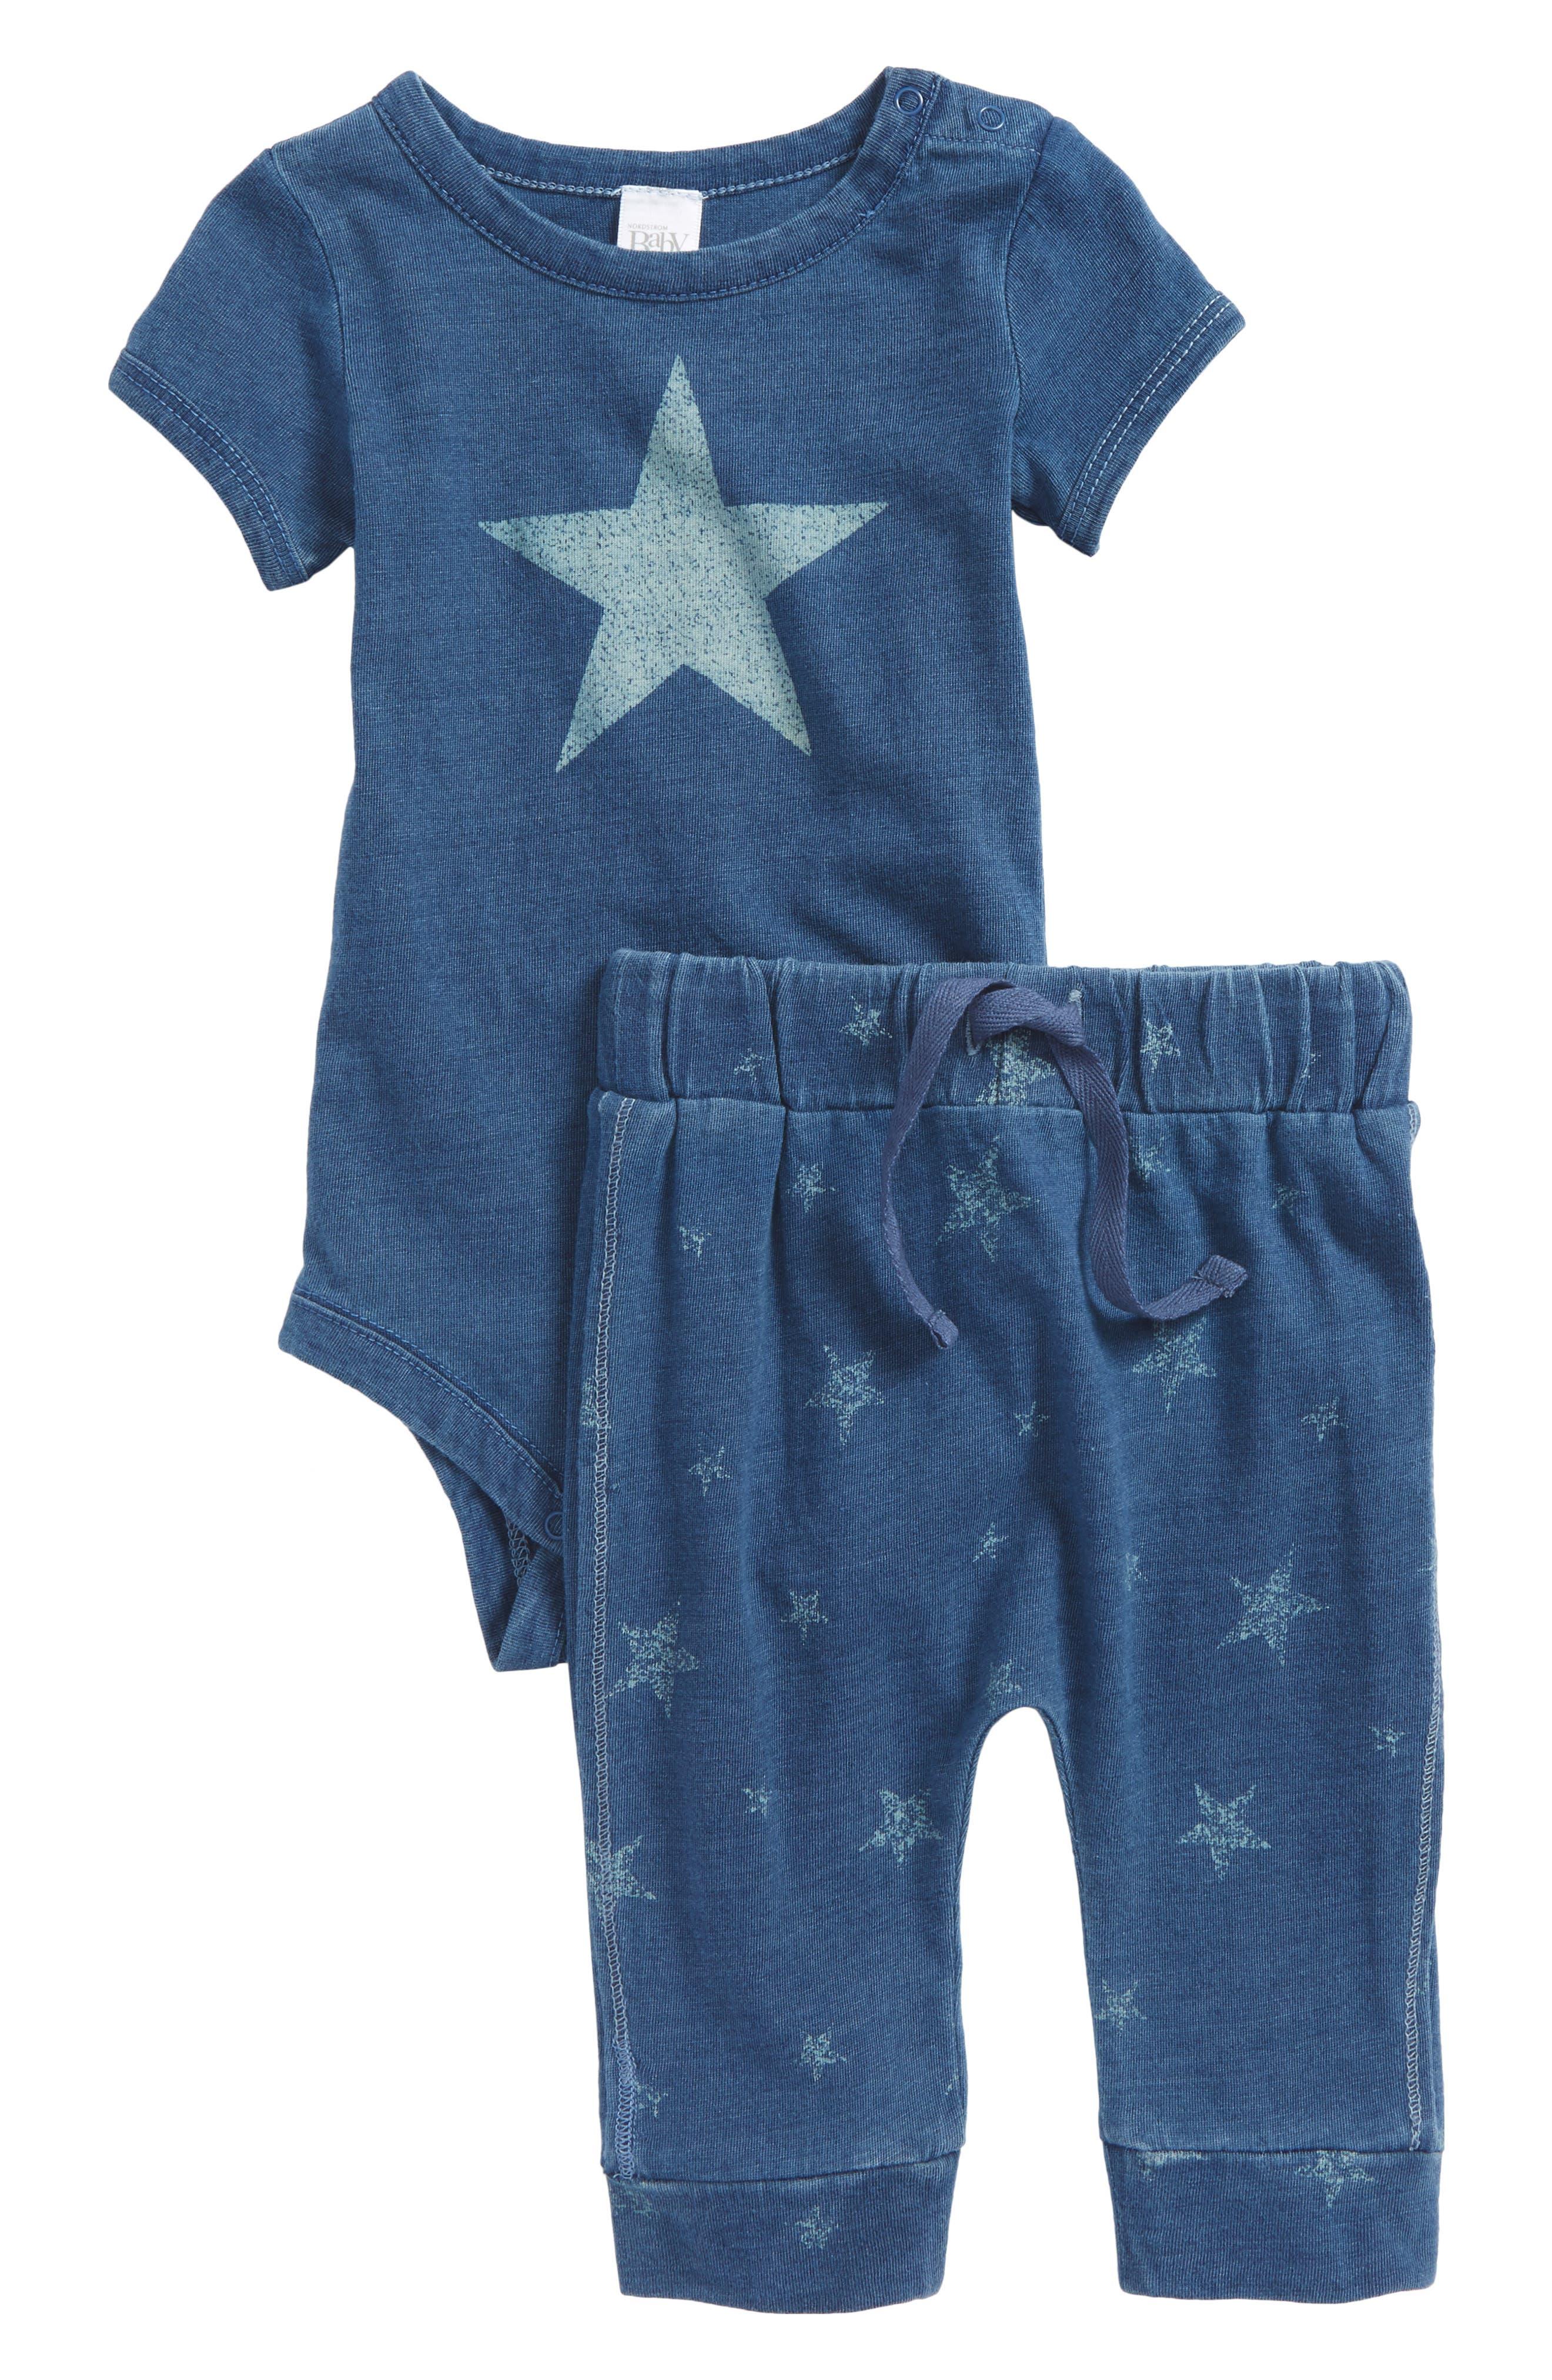 Star Bodysuit & Pants Set,                             Main thumbnail 1, color,                             Blue Indigo Star